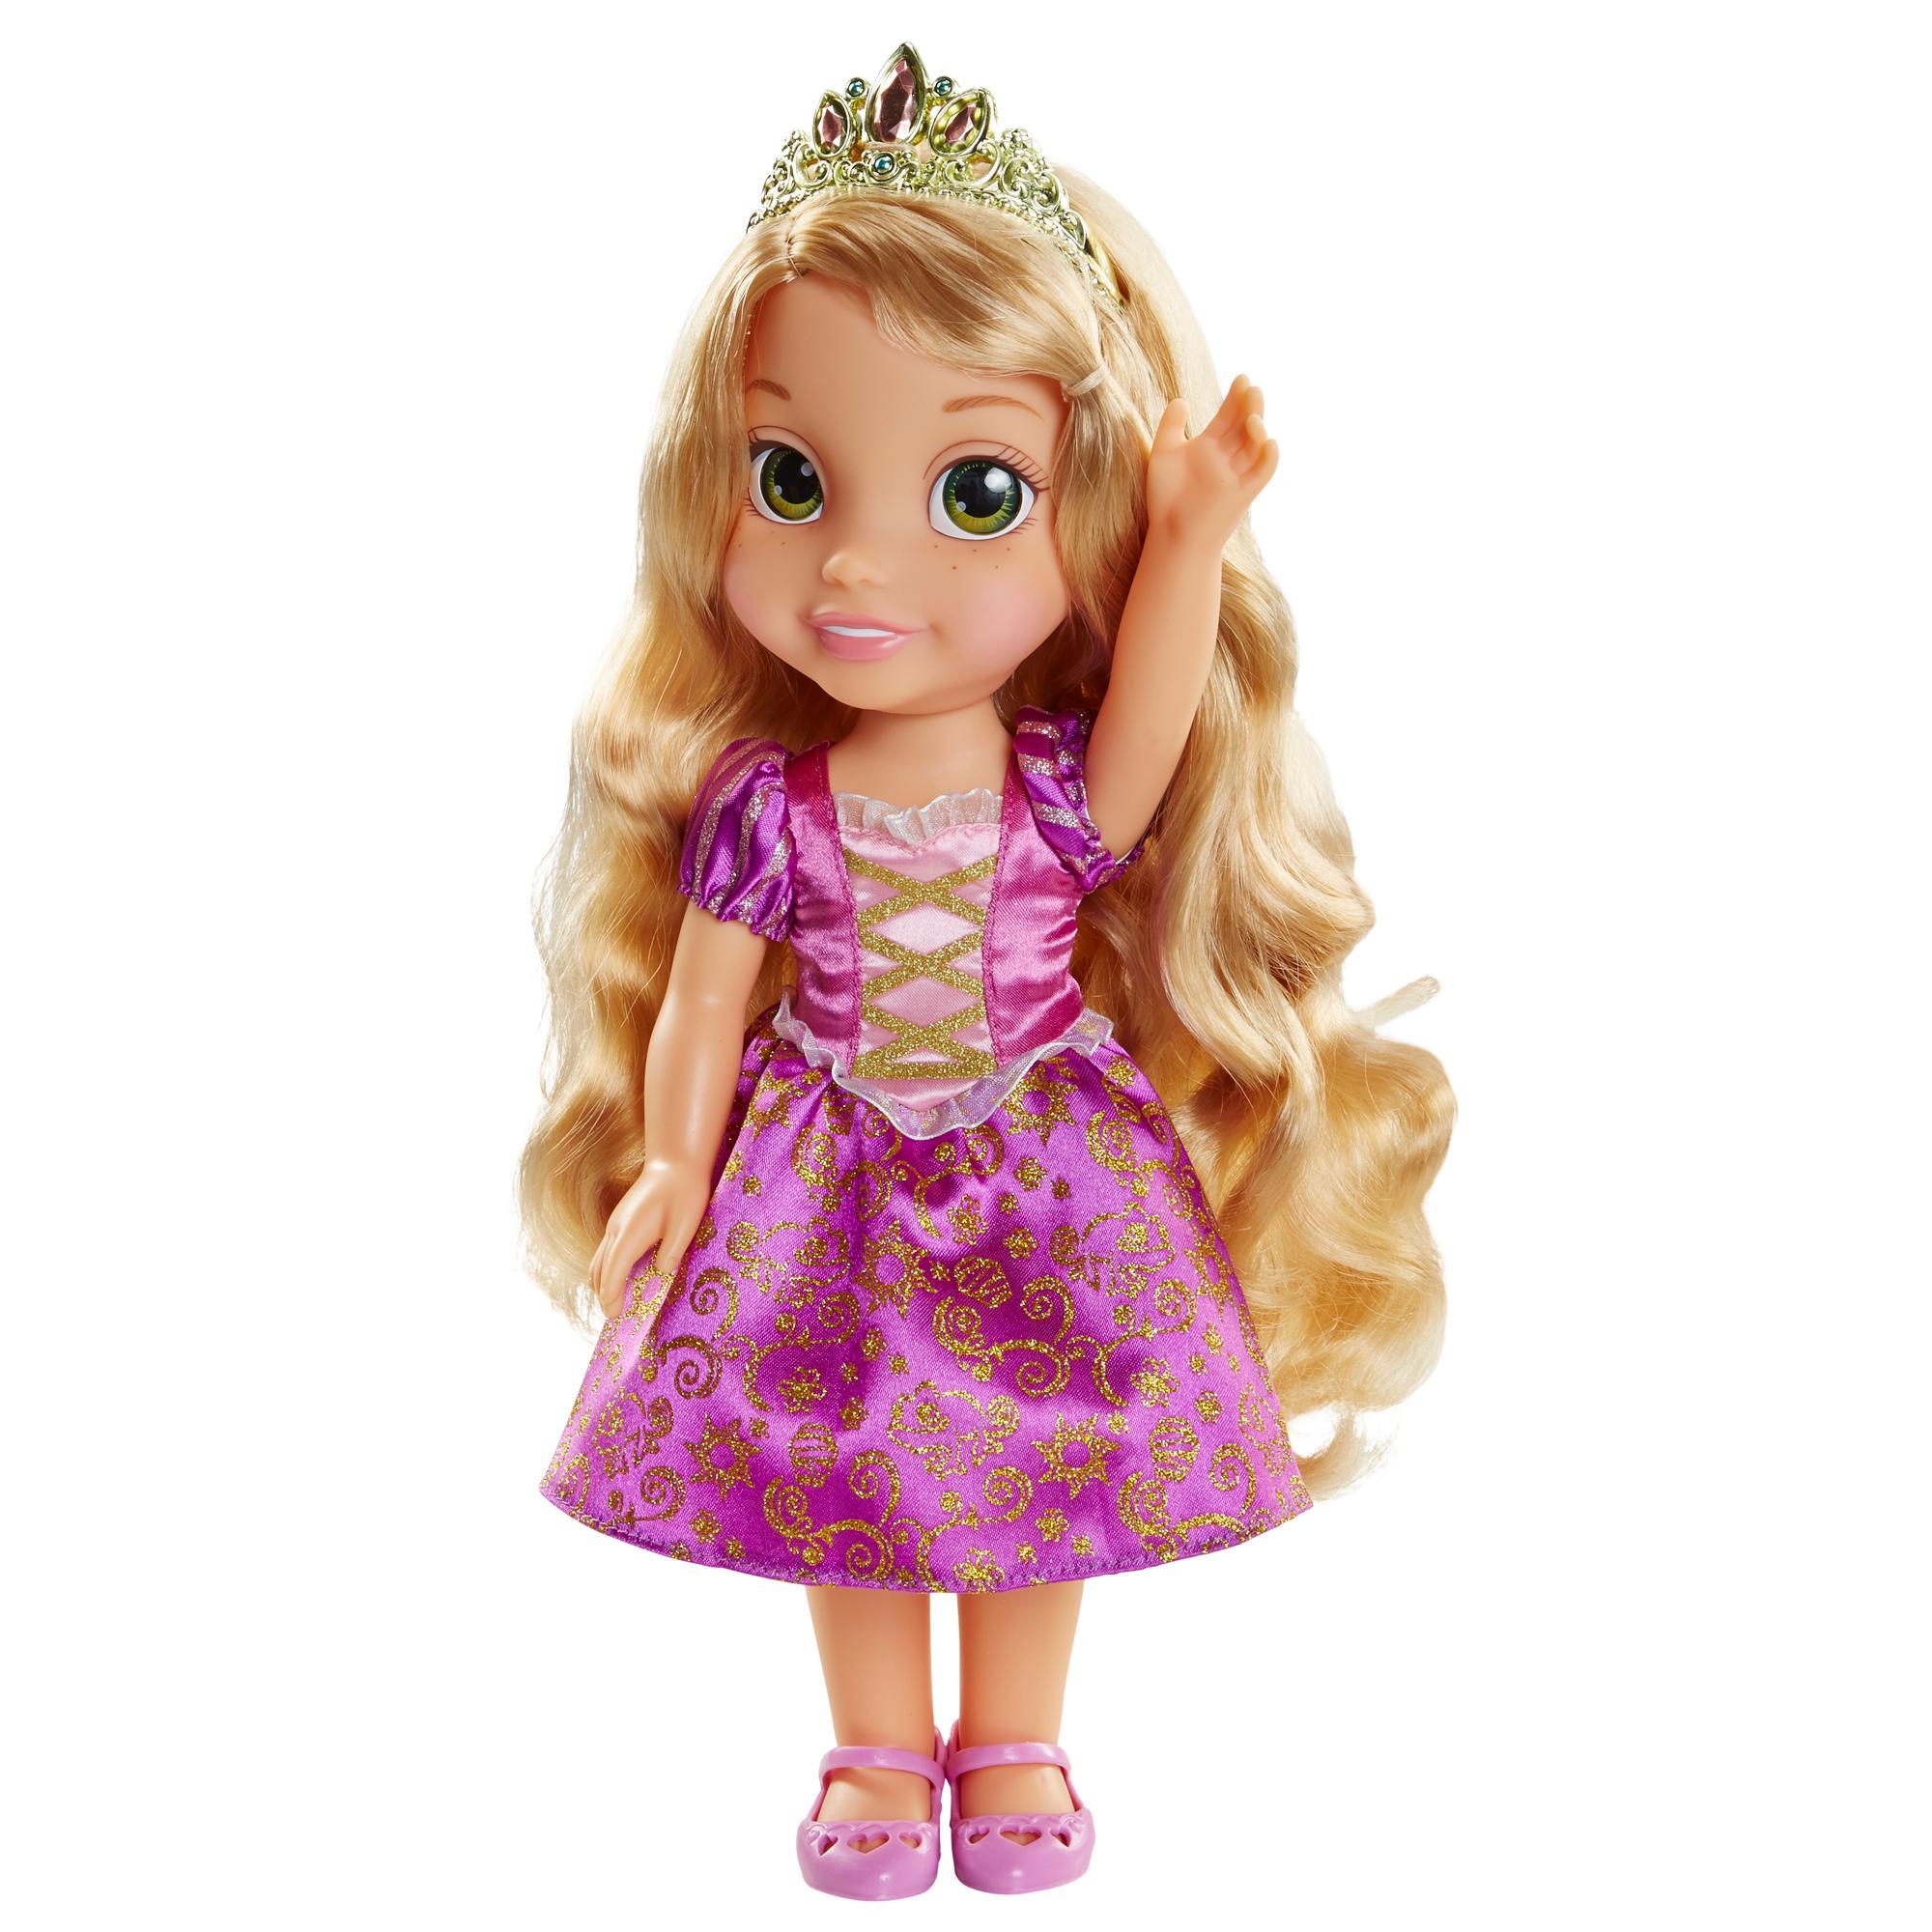 Amazon Com Disney Princess Baby Belle Doll Toys Games: Amazon.com: Disney Princess Rapunzel Toddler Doll: Toys